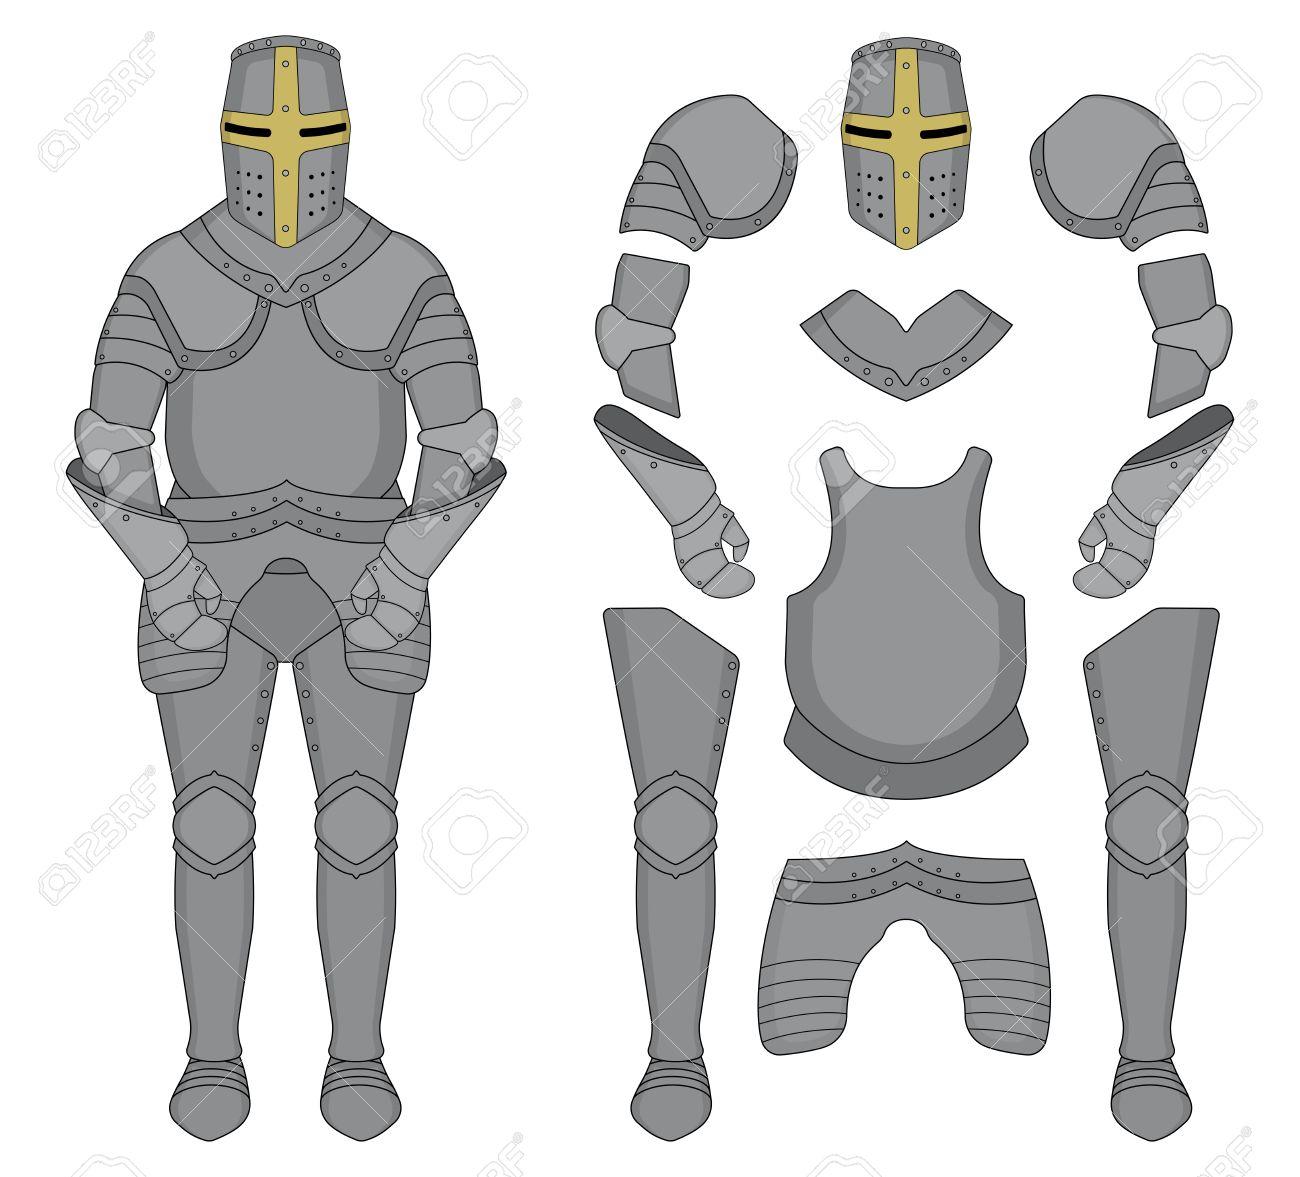 Medieval templar knight armor set. Helmet, shoulders, gloves, breastplate, leggings. Color clip art vector illustration isolated on white - 40557278